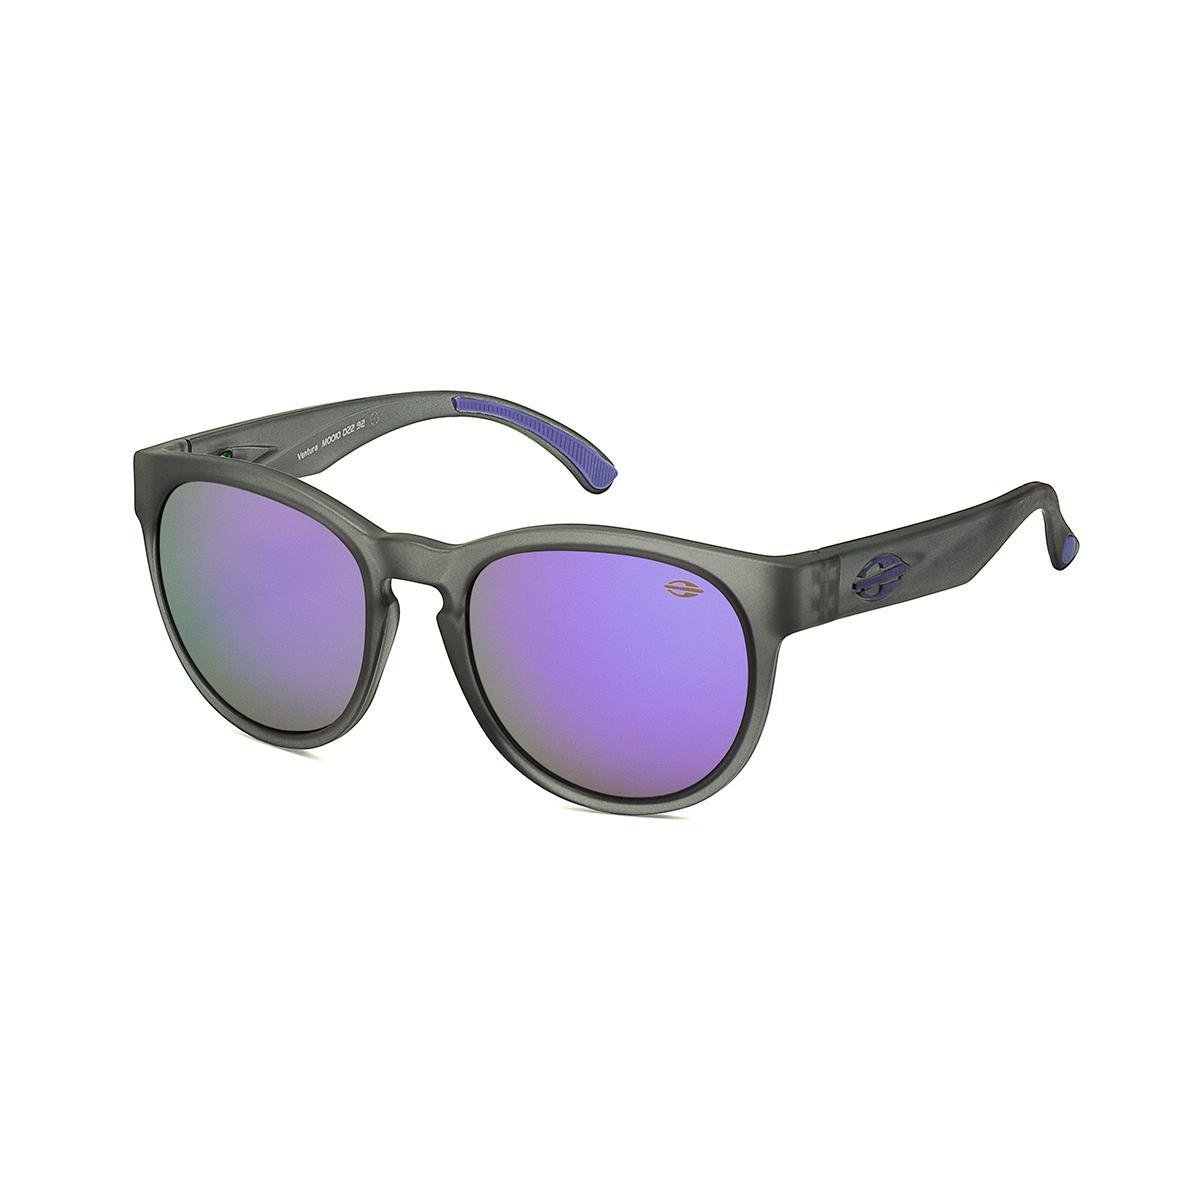 56eb4a0dcf3cf Oculos Sol Mormaii Ventura - Cinza - Compre Agora